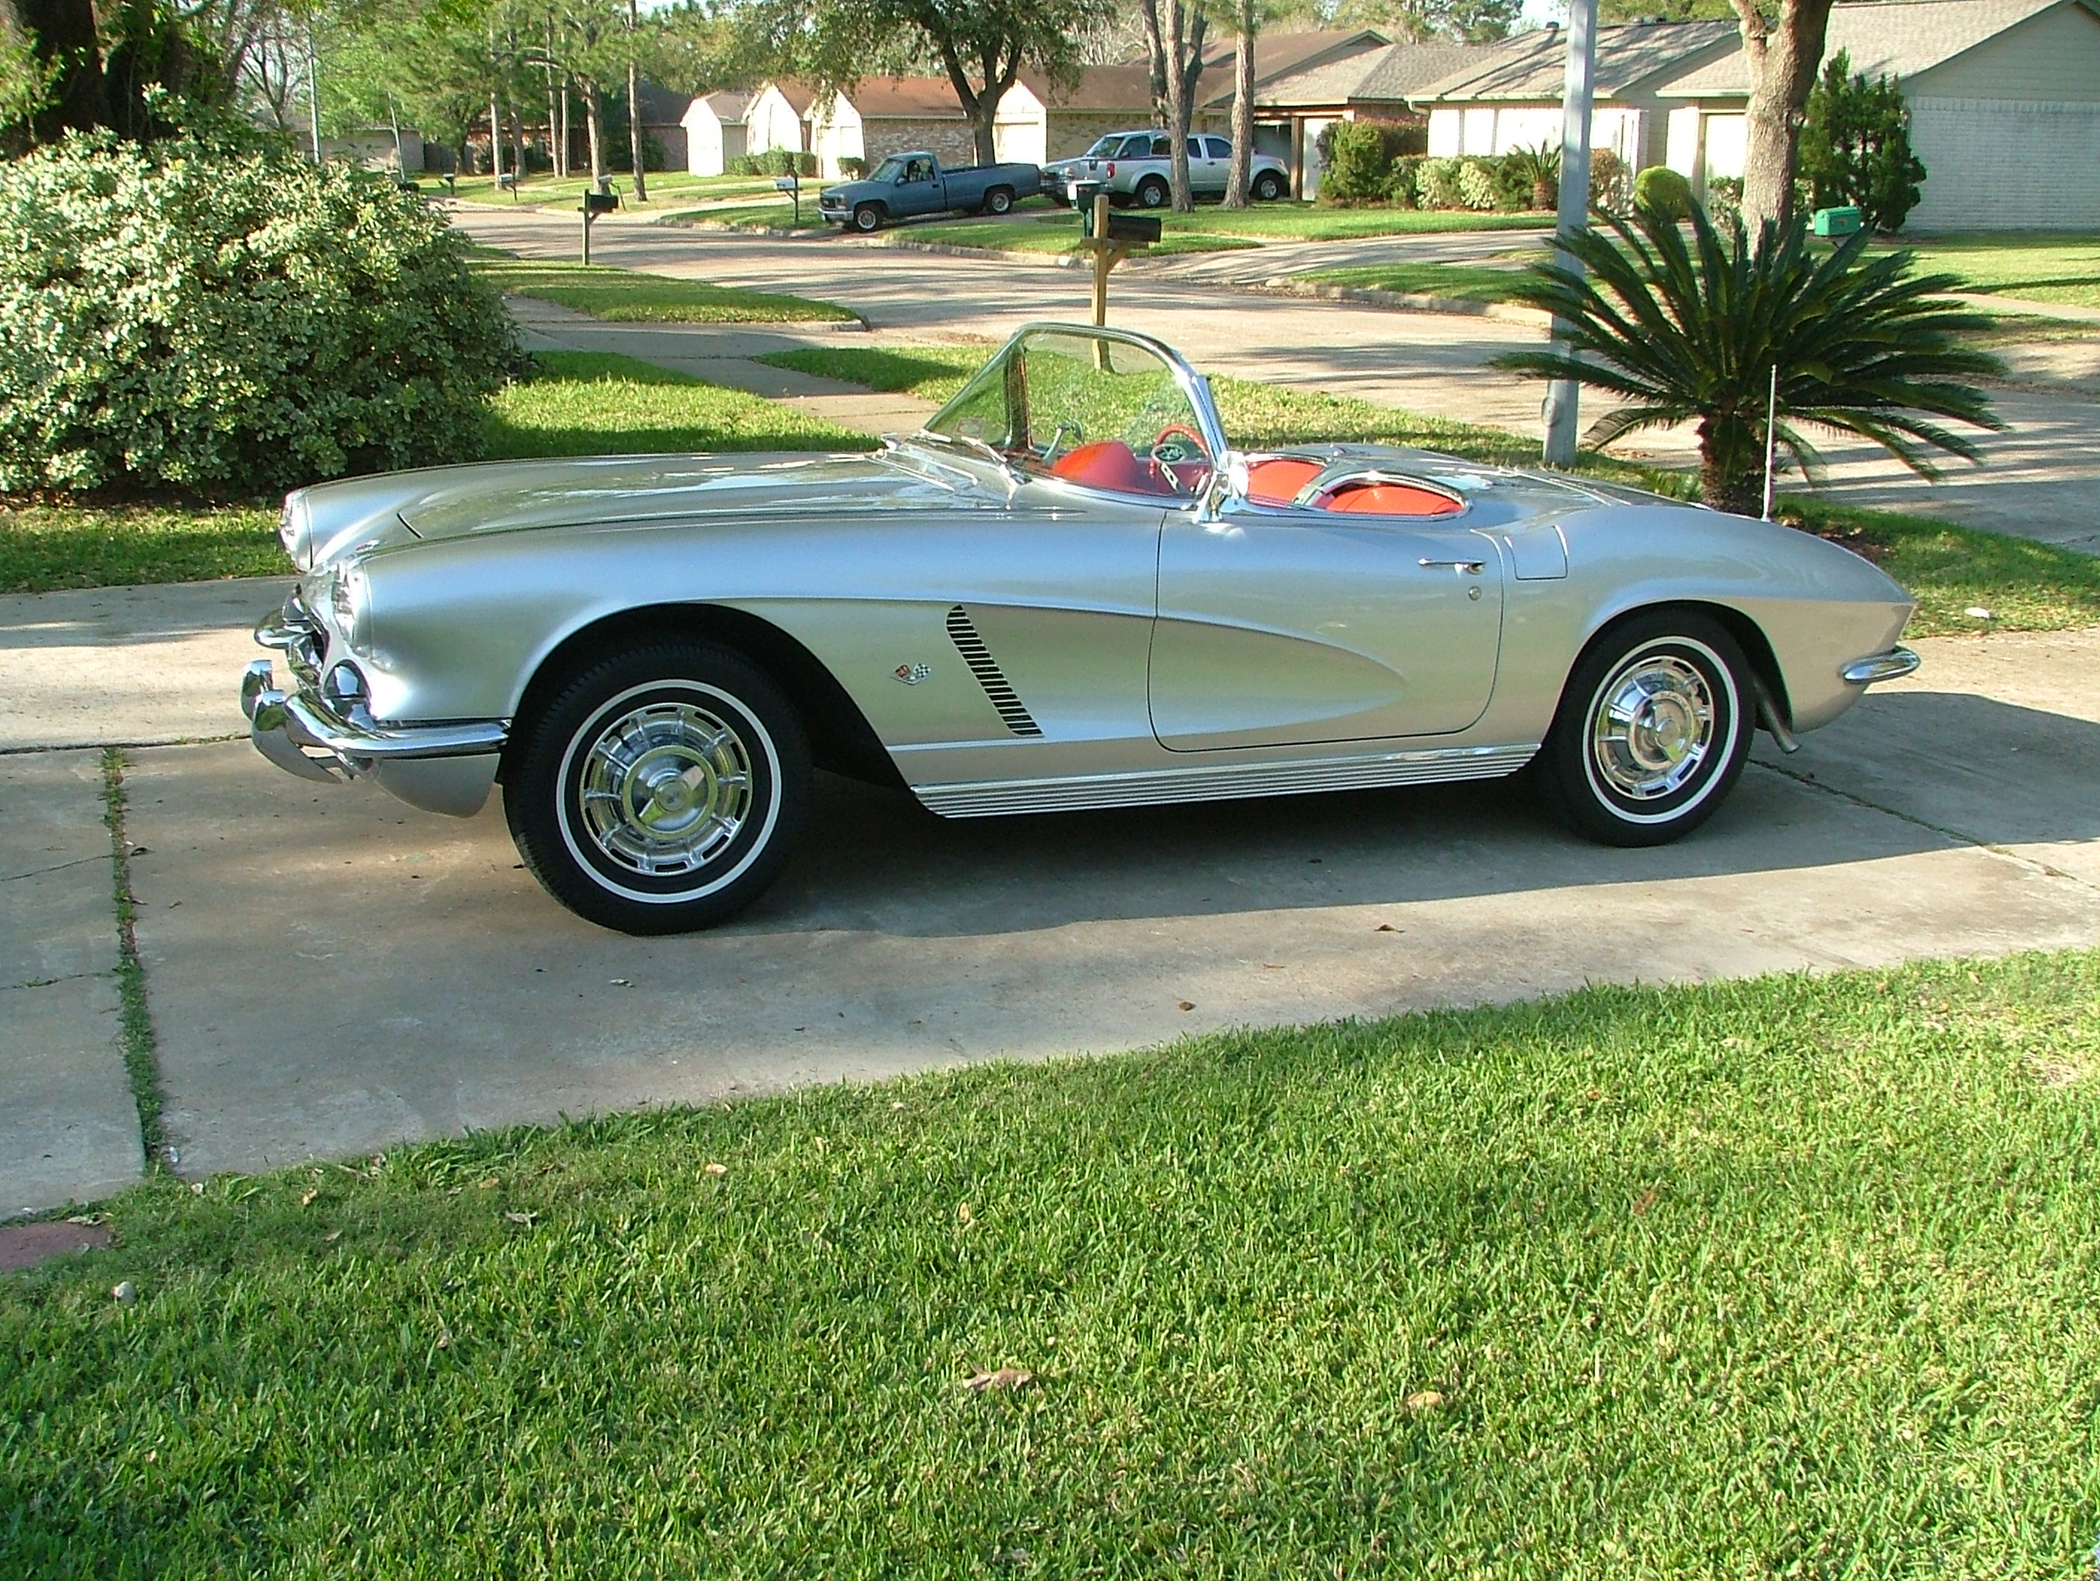 1962 Chevrolet Corvette 1962 Corvette Askautoexperts Com